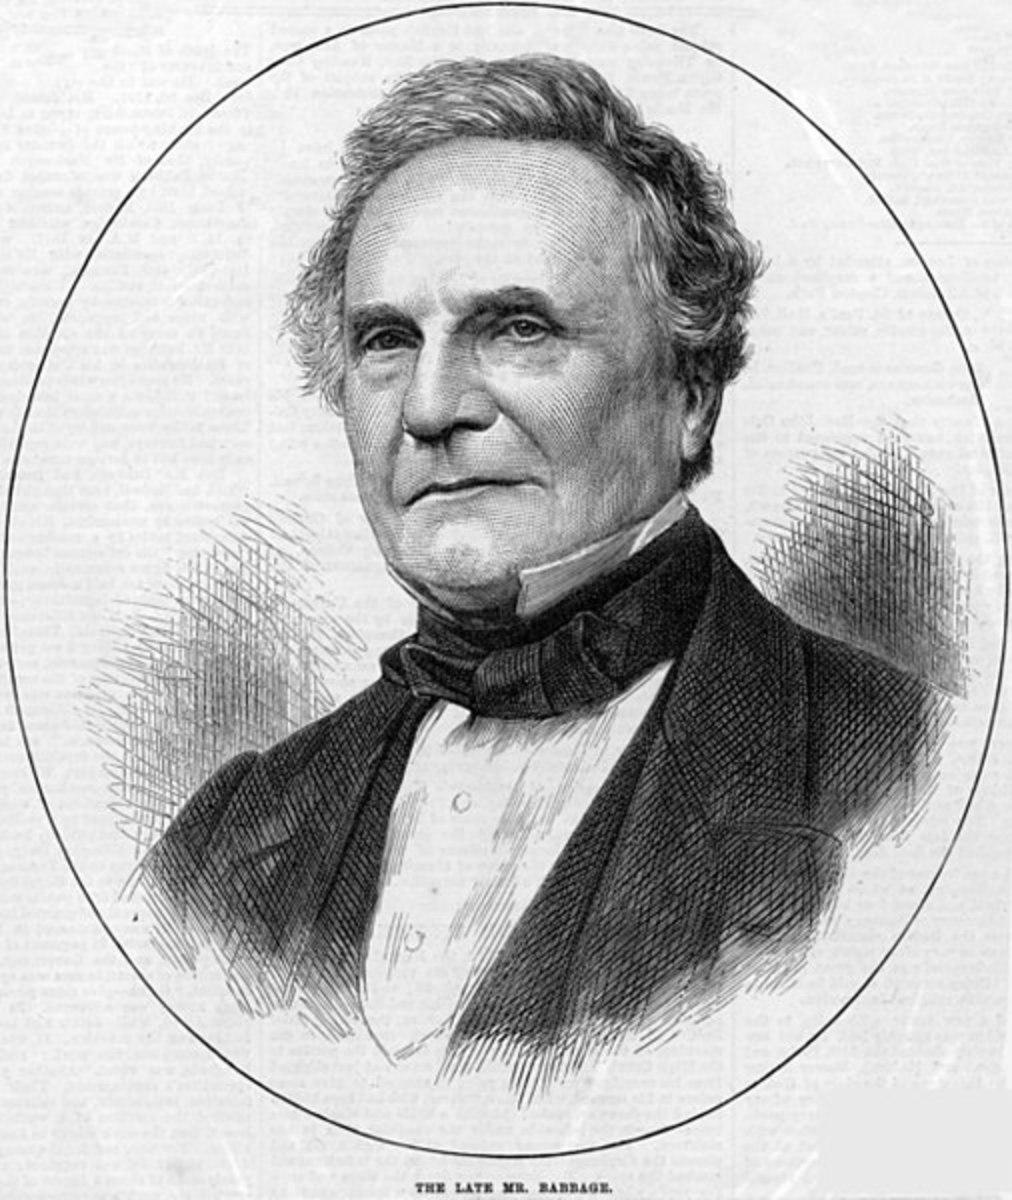 Charles Babbage c. 1860.